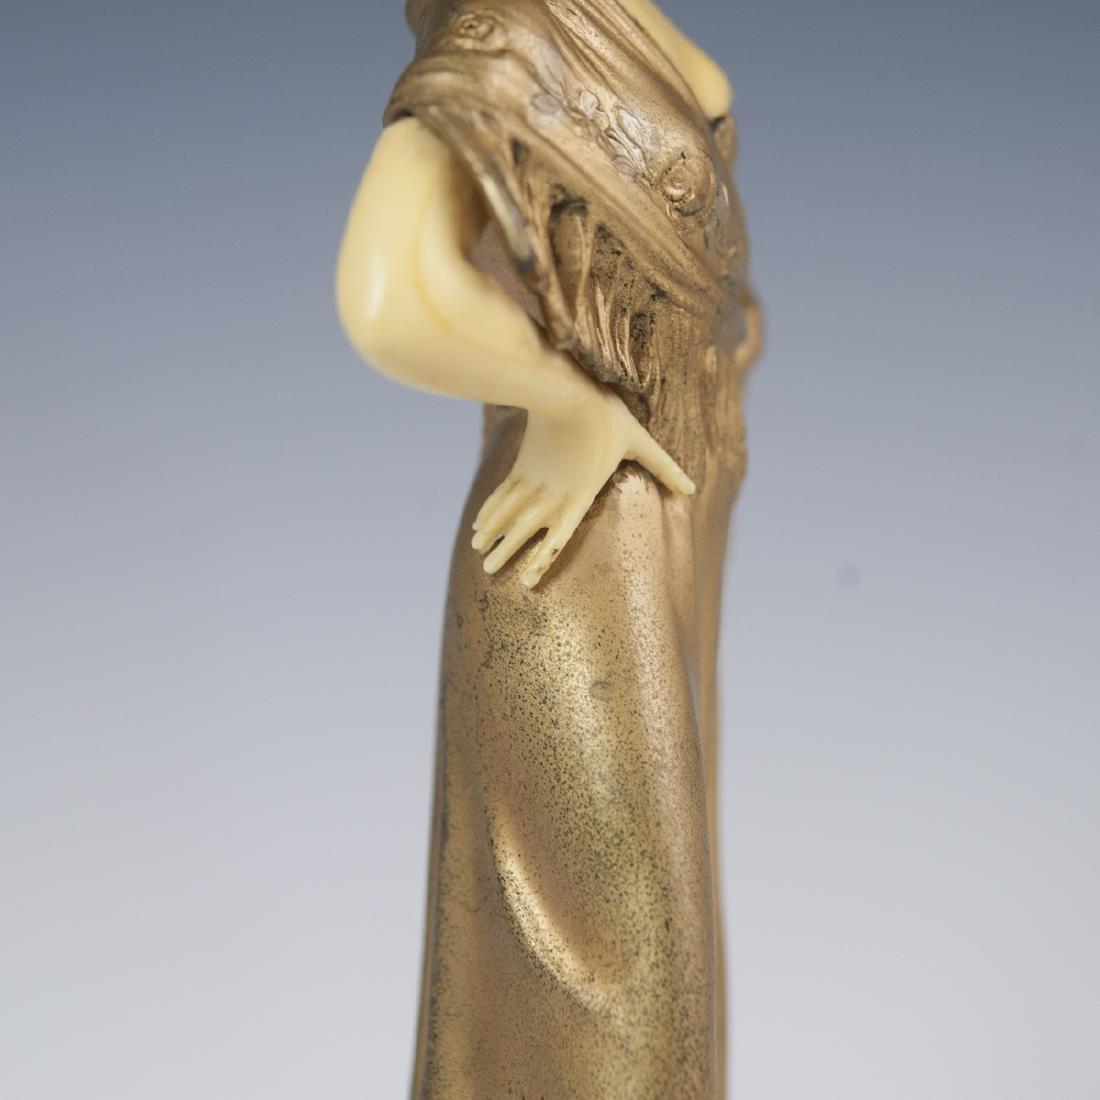 Art Deco Polychromed Spelter Sculpture - 4